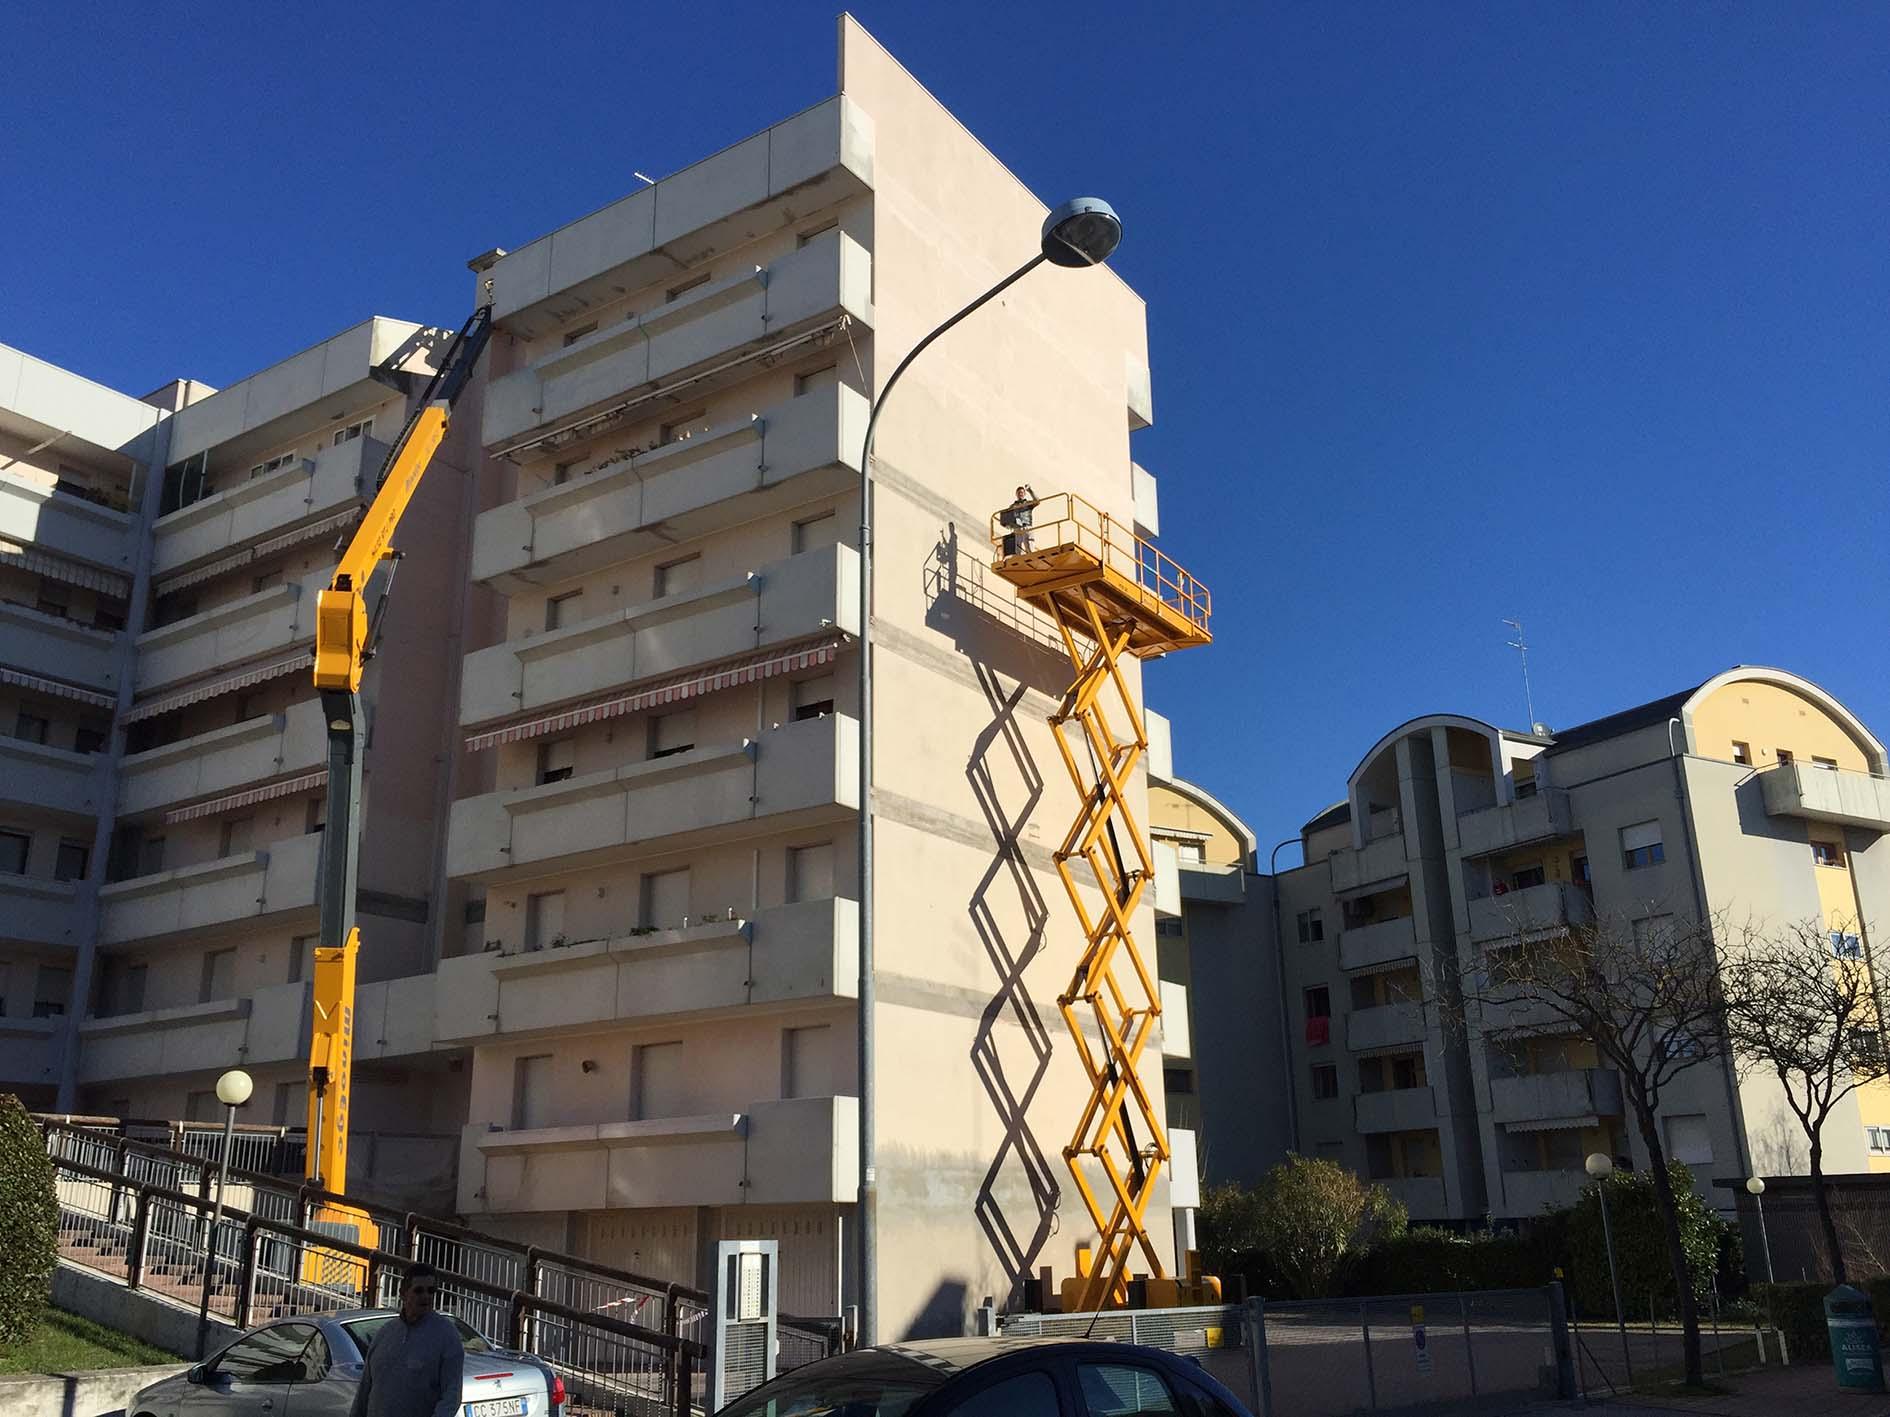 Due Haulotte per la riqualificazione edilizia -  -In quota Noleggio Notizie Piattaforme aeree - MC5.0-Macchine Cantieri